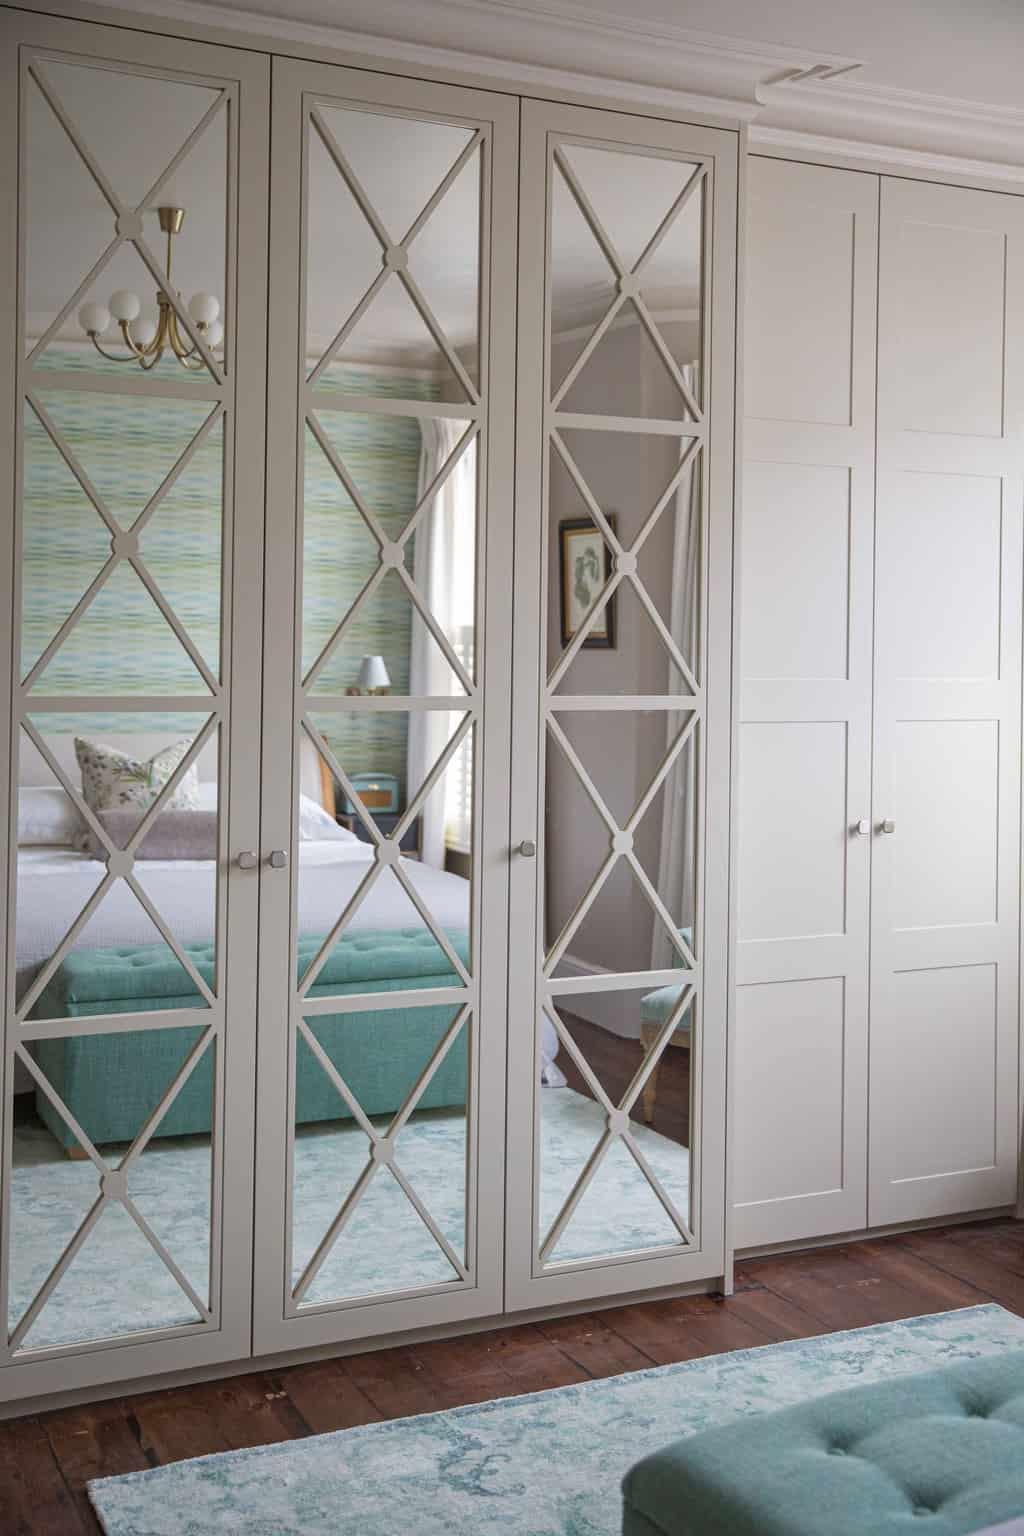 interior design, project management, house home refurbishment, renovation, extension, modernisation, balham, wandsworth